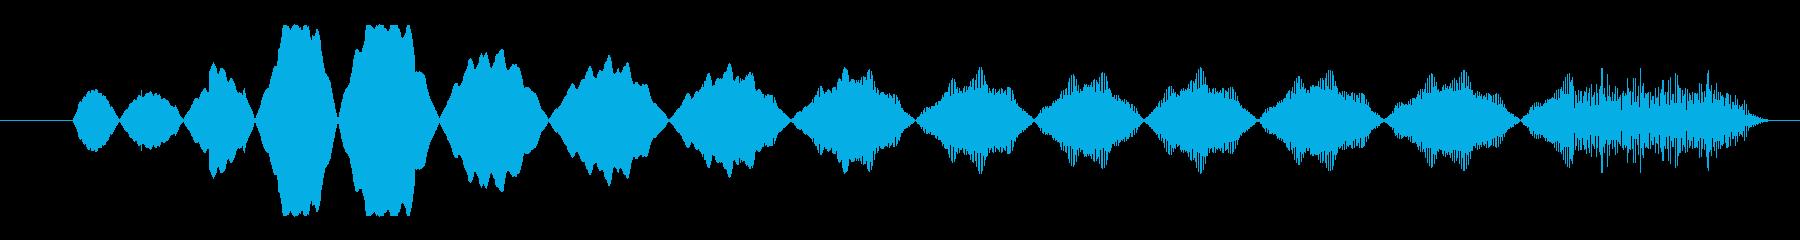 FX アクセス拒否01の再生済みの波形